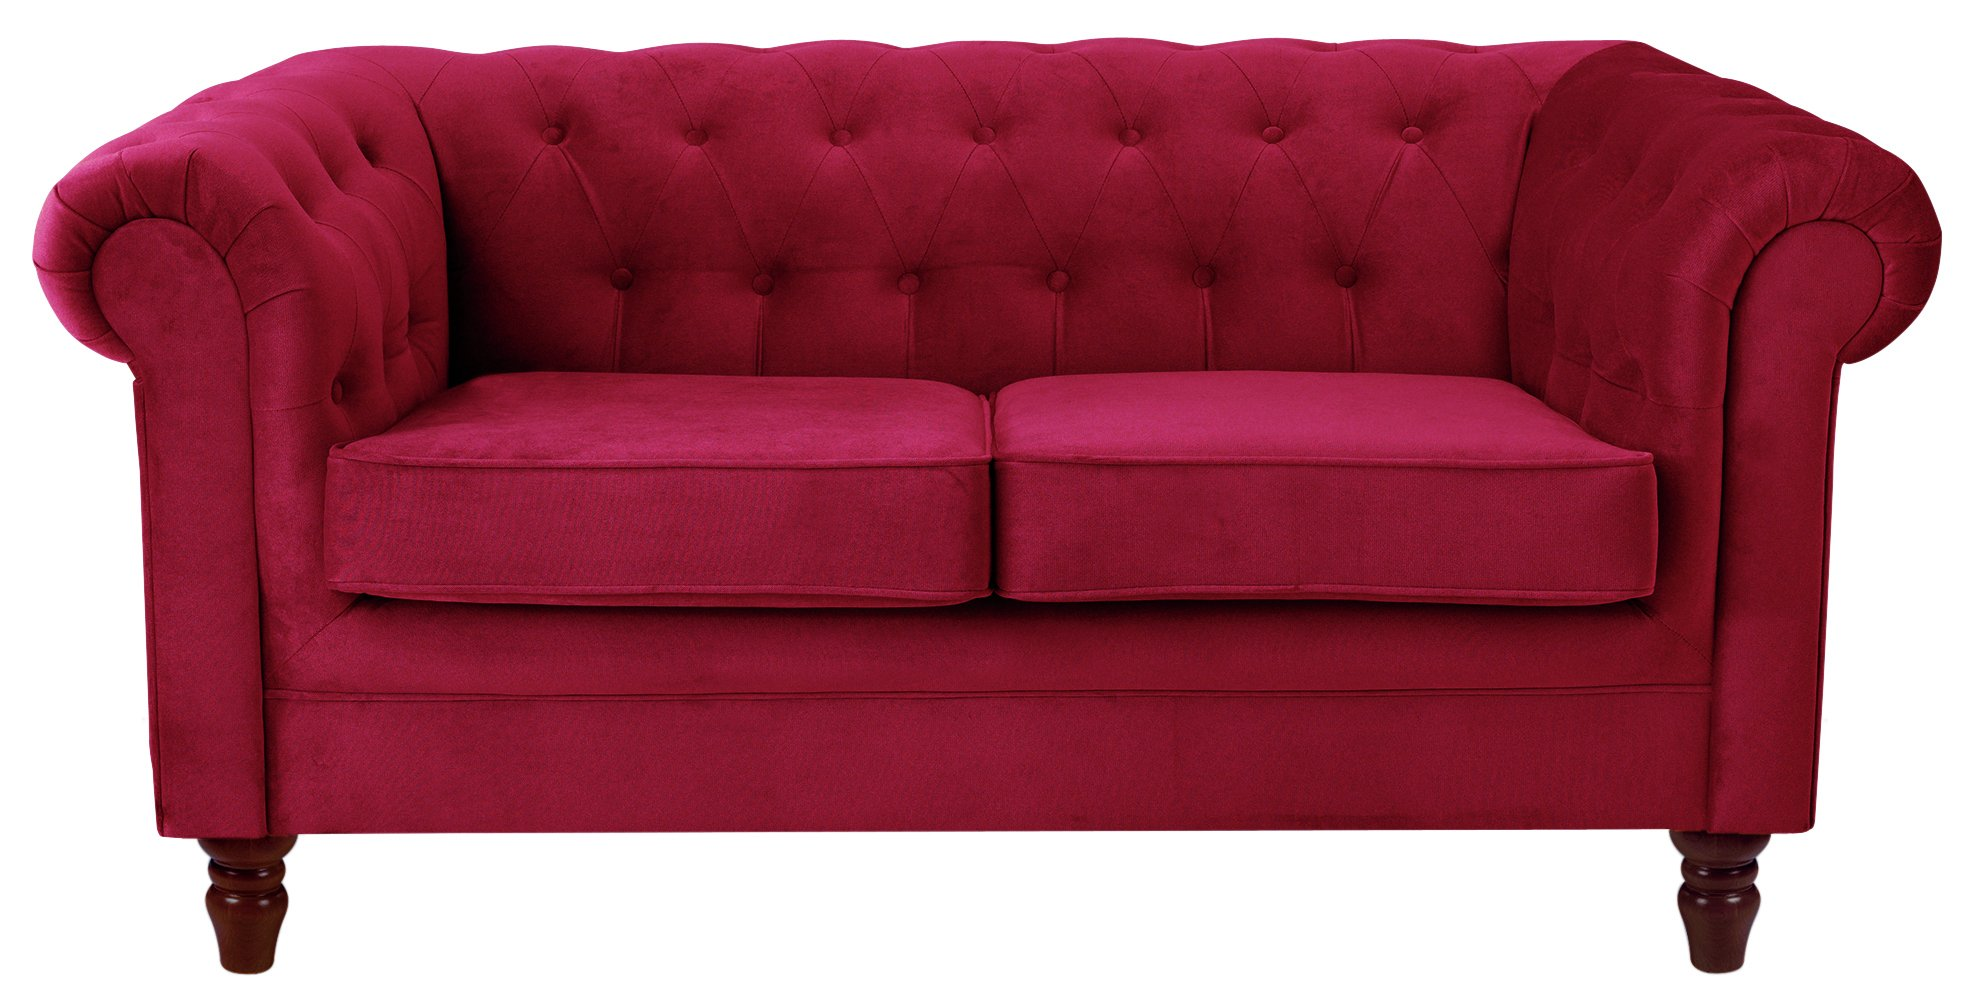 fabric chesterfield sofa argos lexington sofas heart of house 2 seater red